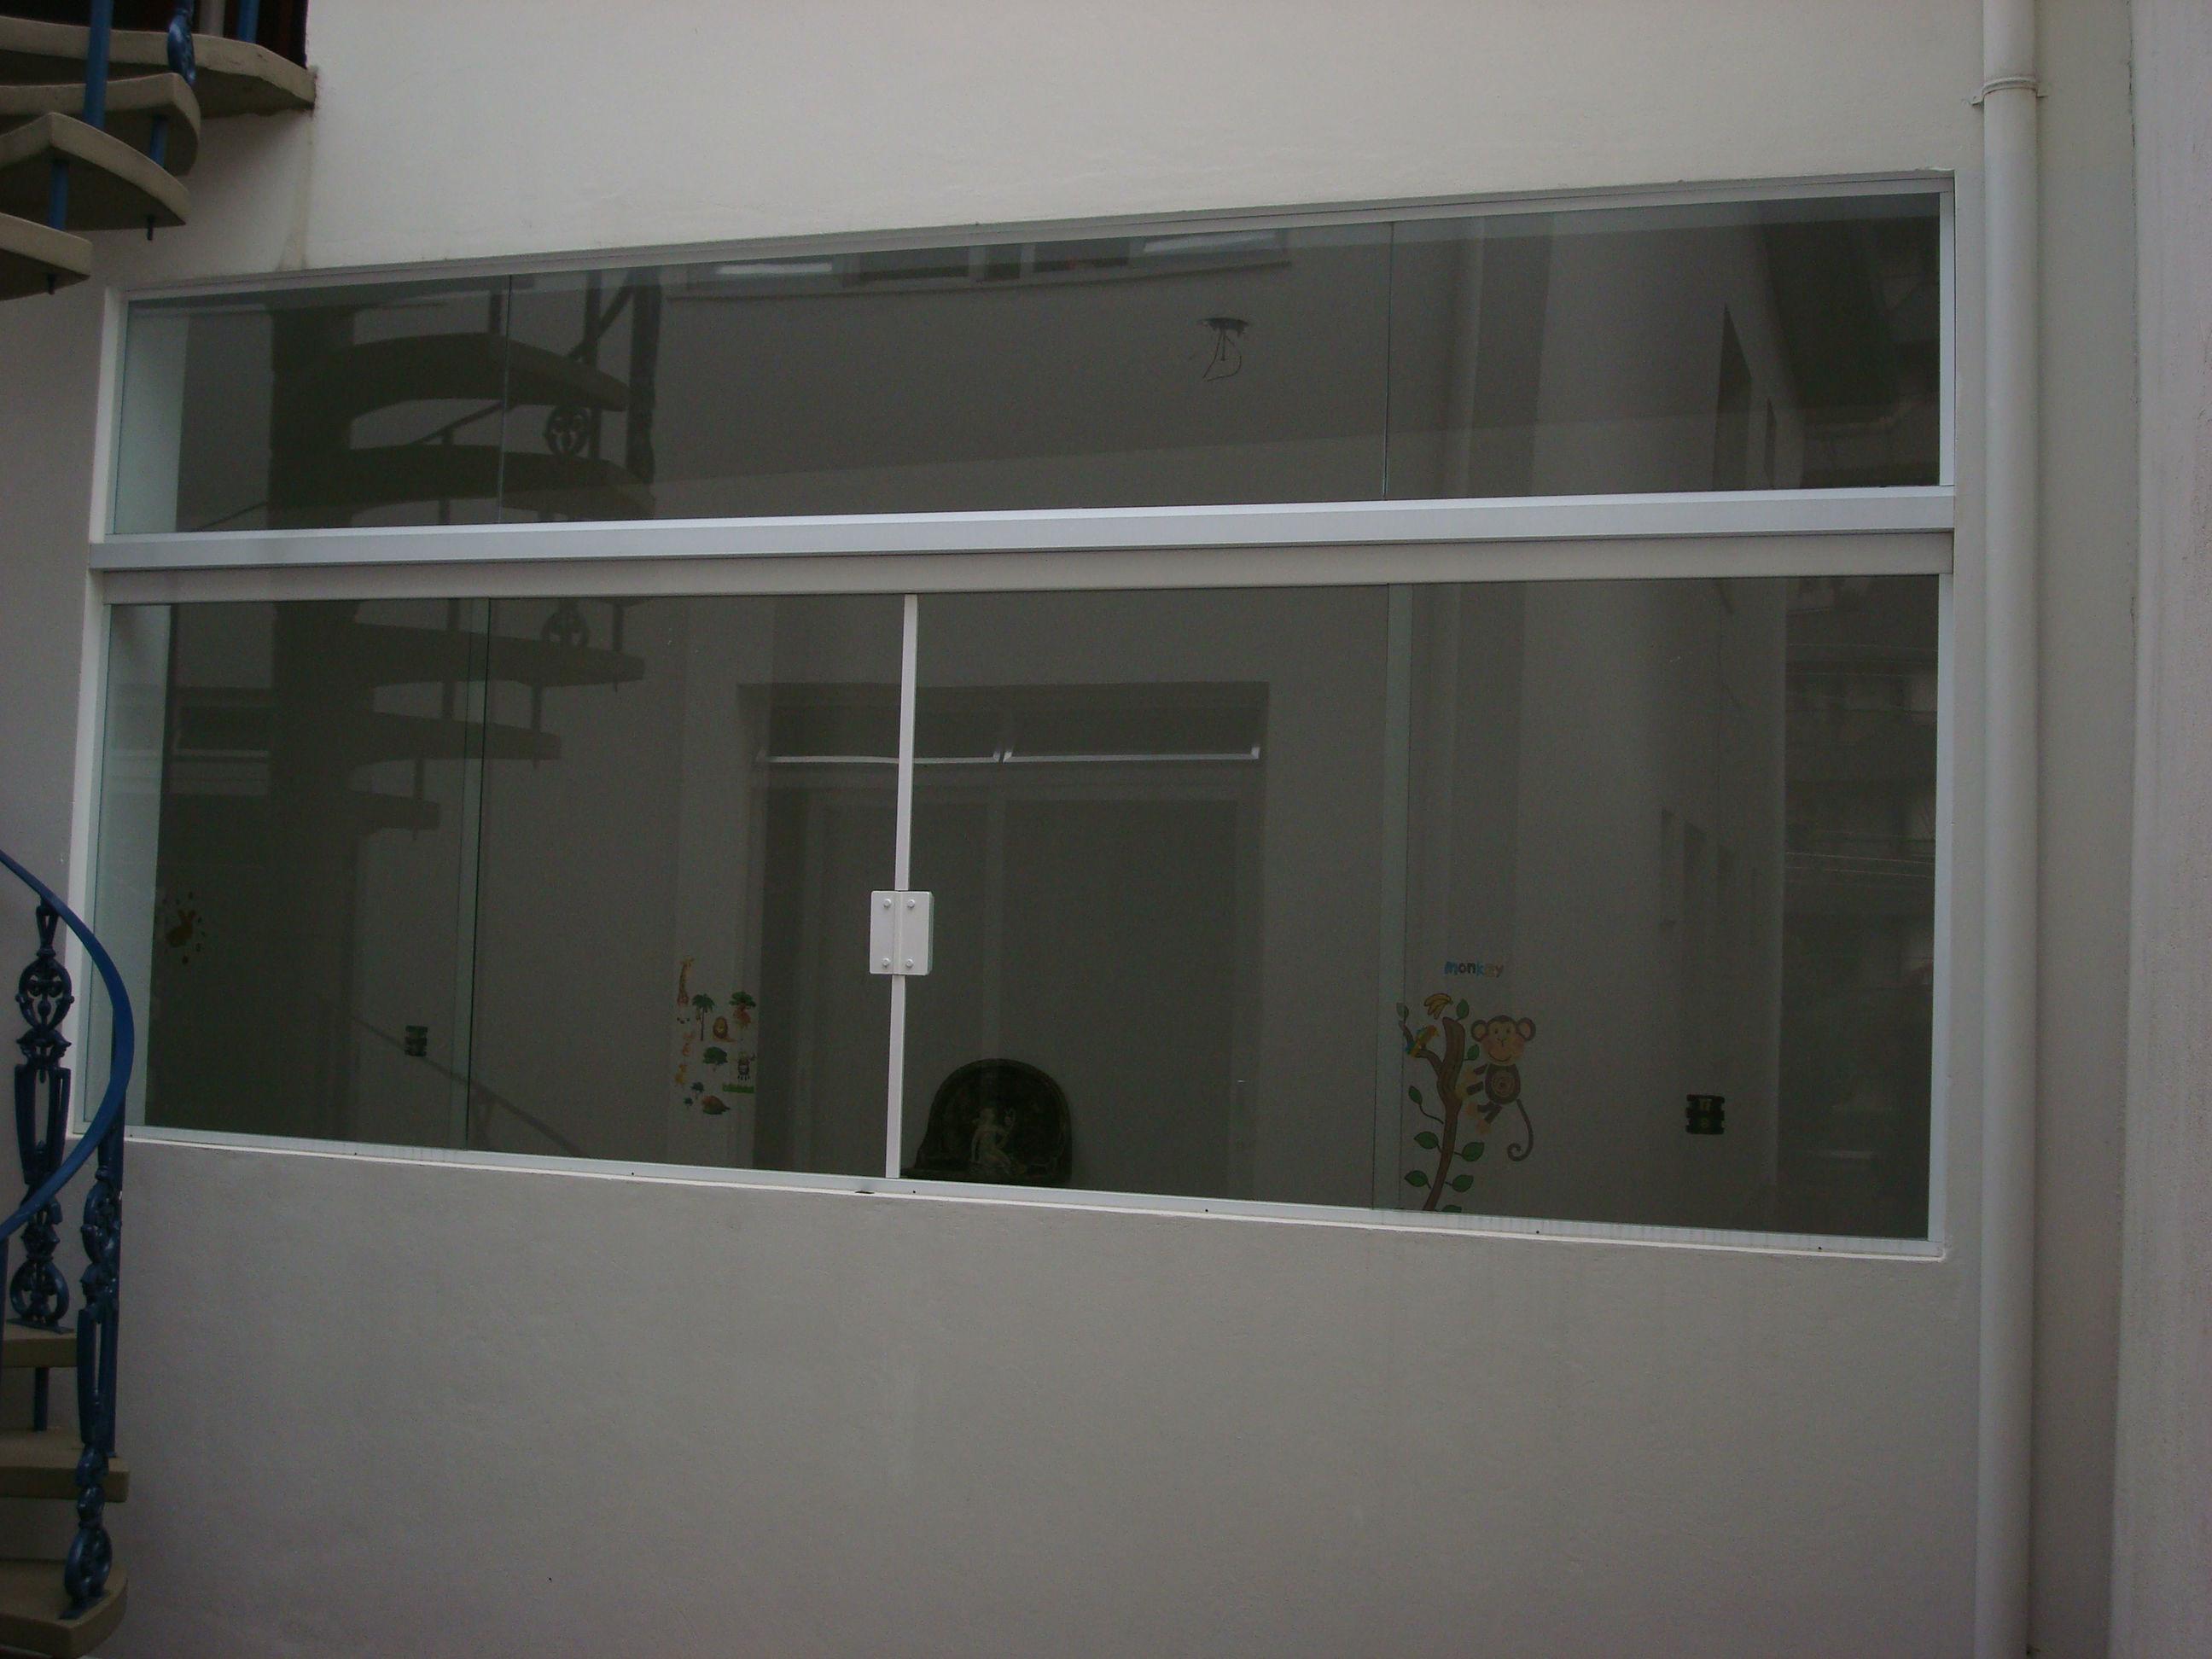 #5F656C Pin Janelas De Vidro Para Ampliar Portas E Janelas De Vidro on  340 Janelas De Vidro Temperado Ou Madeira